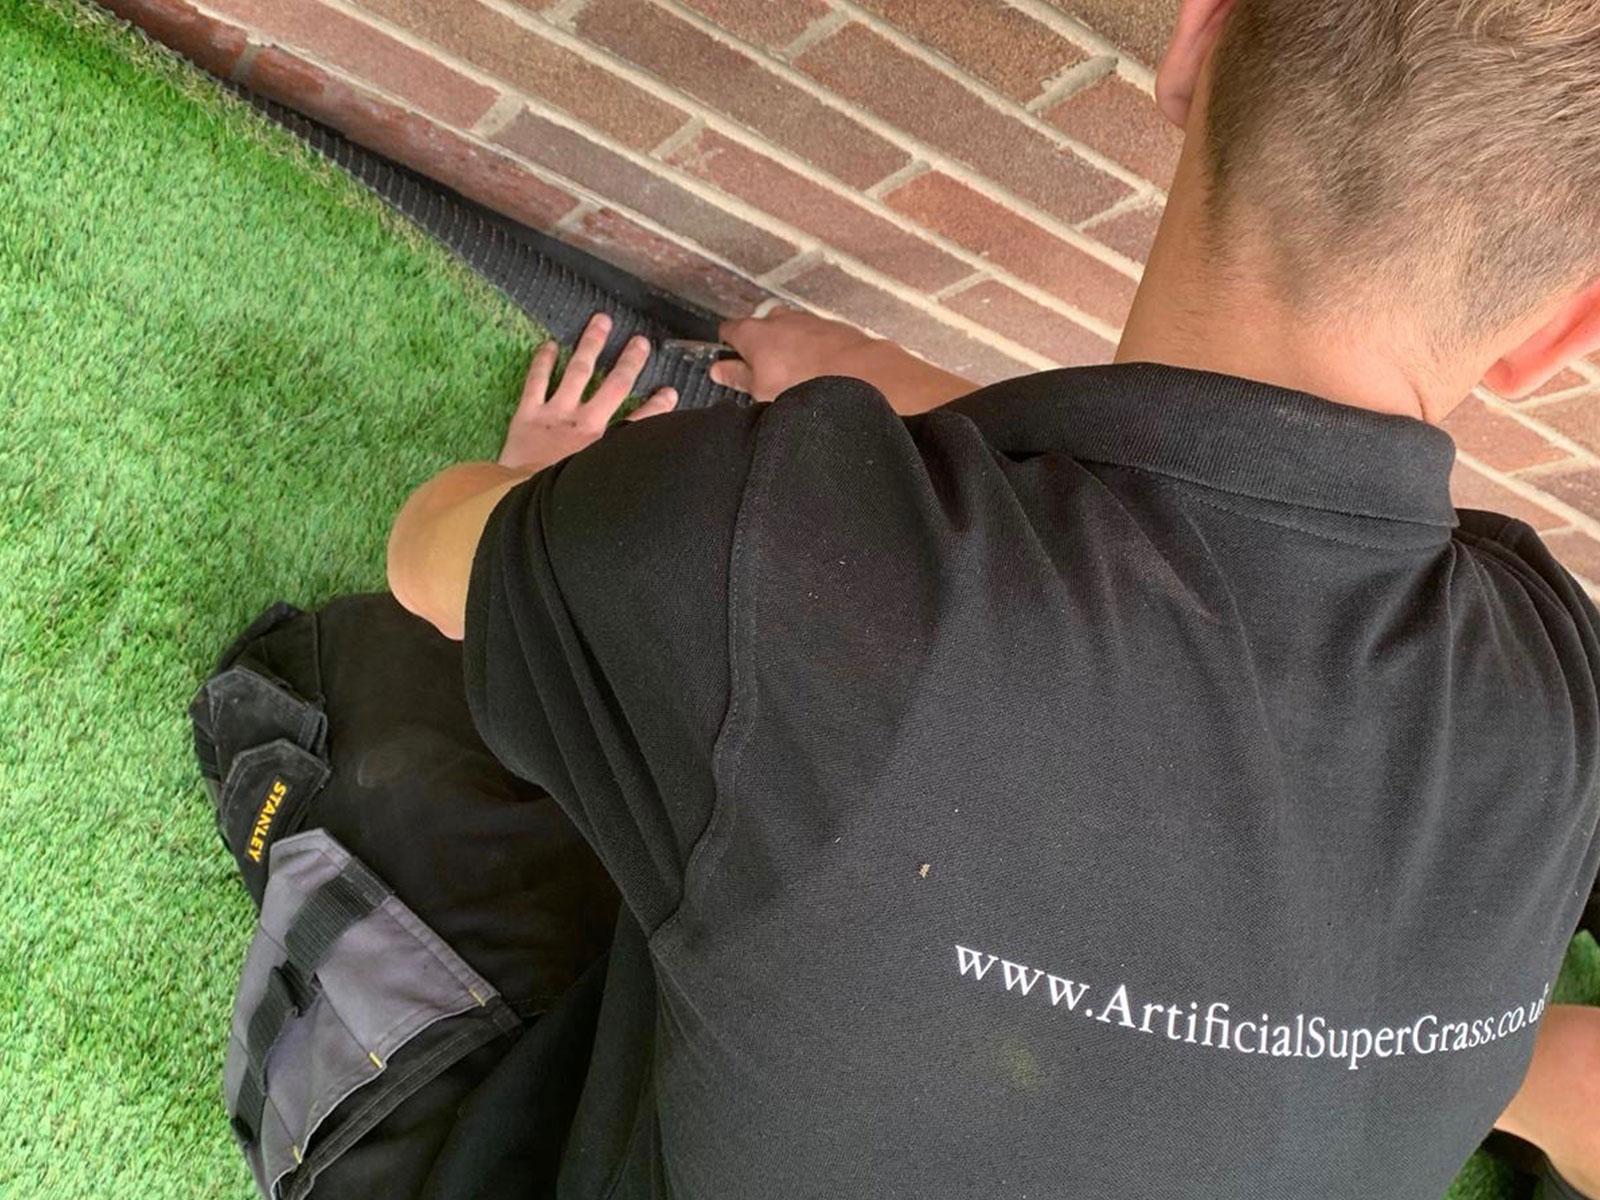 Fake Grass For Dogs Bakewell Artificial Super Grass